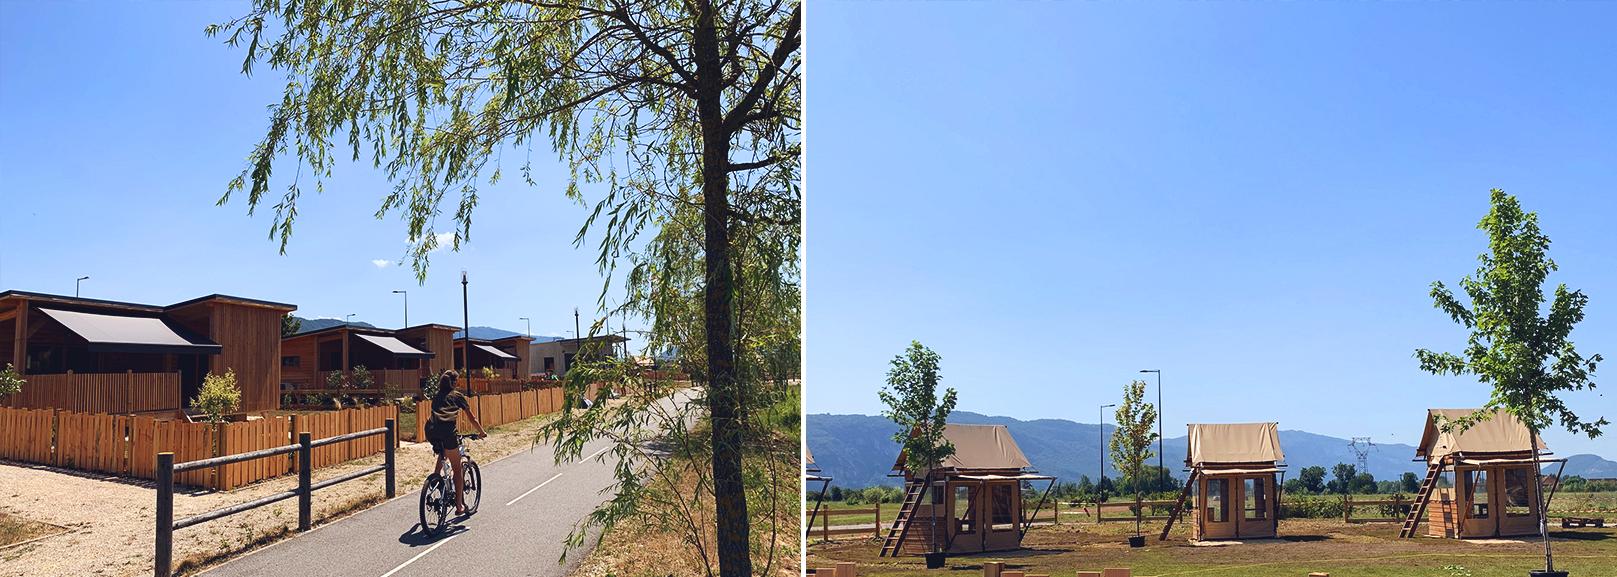 Lodges ViaRhôna